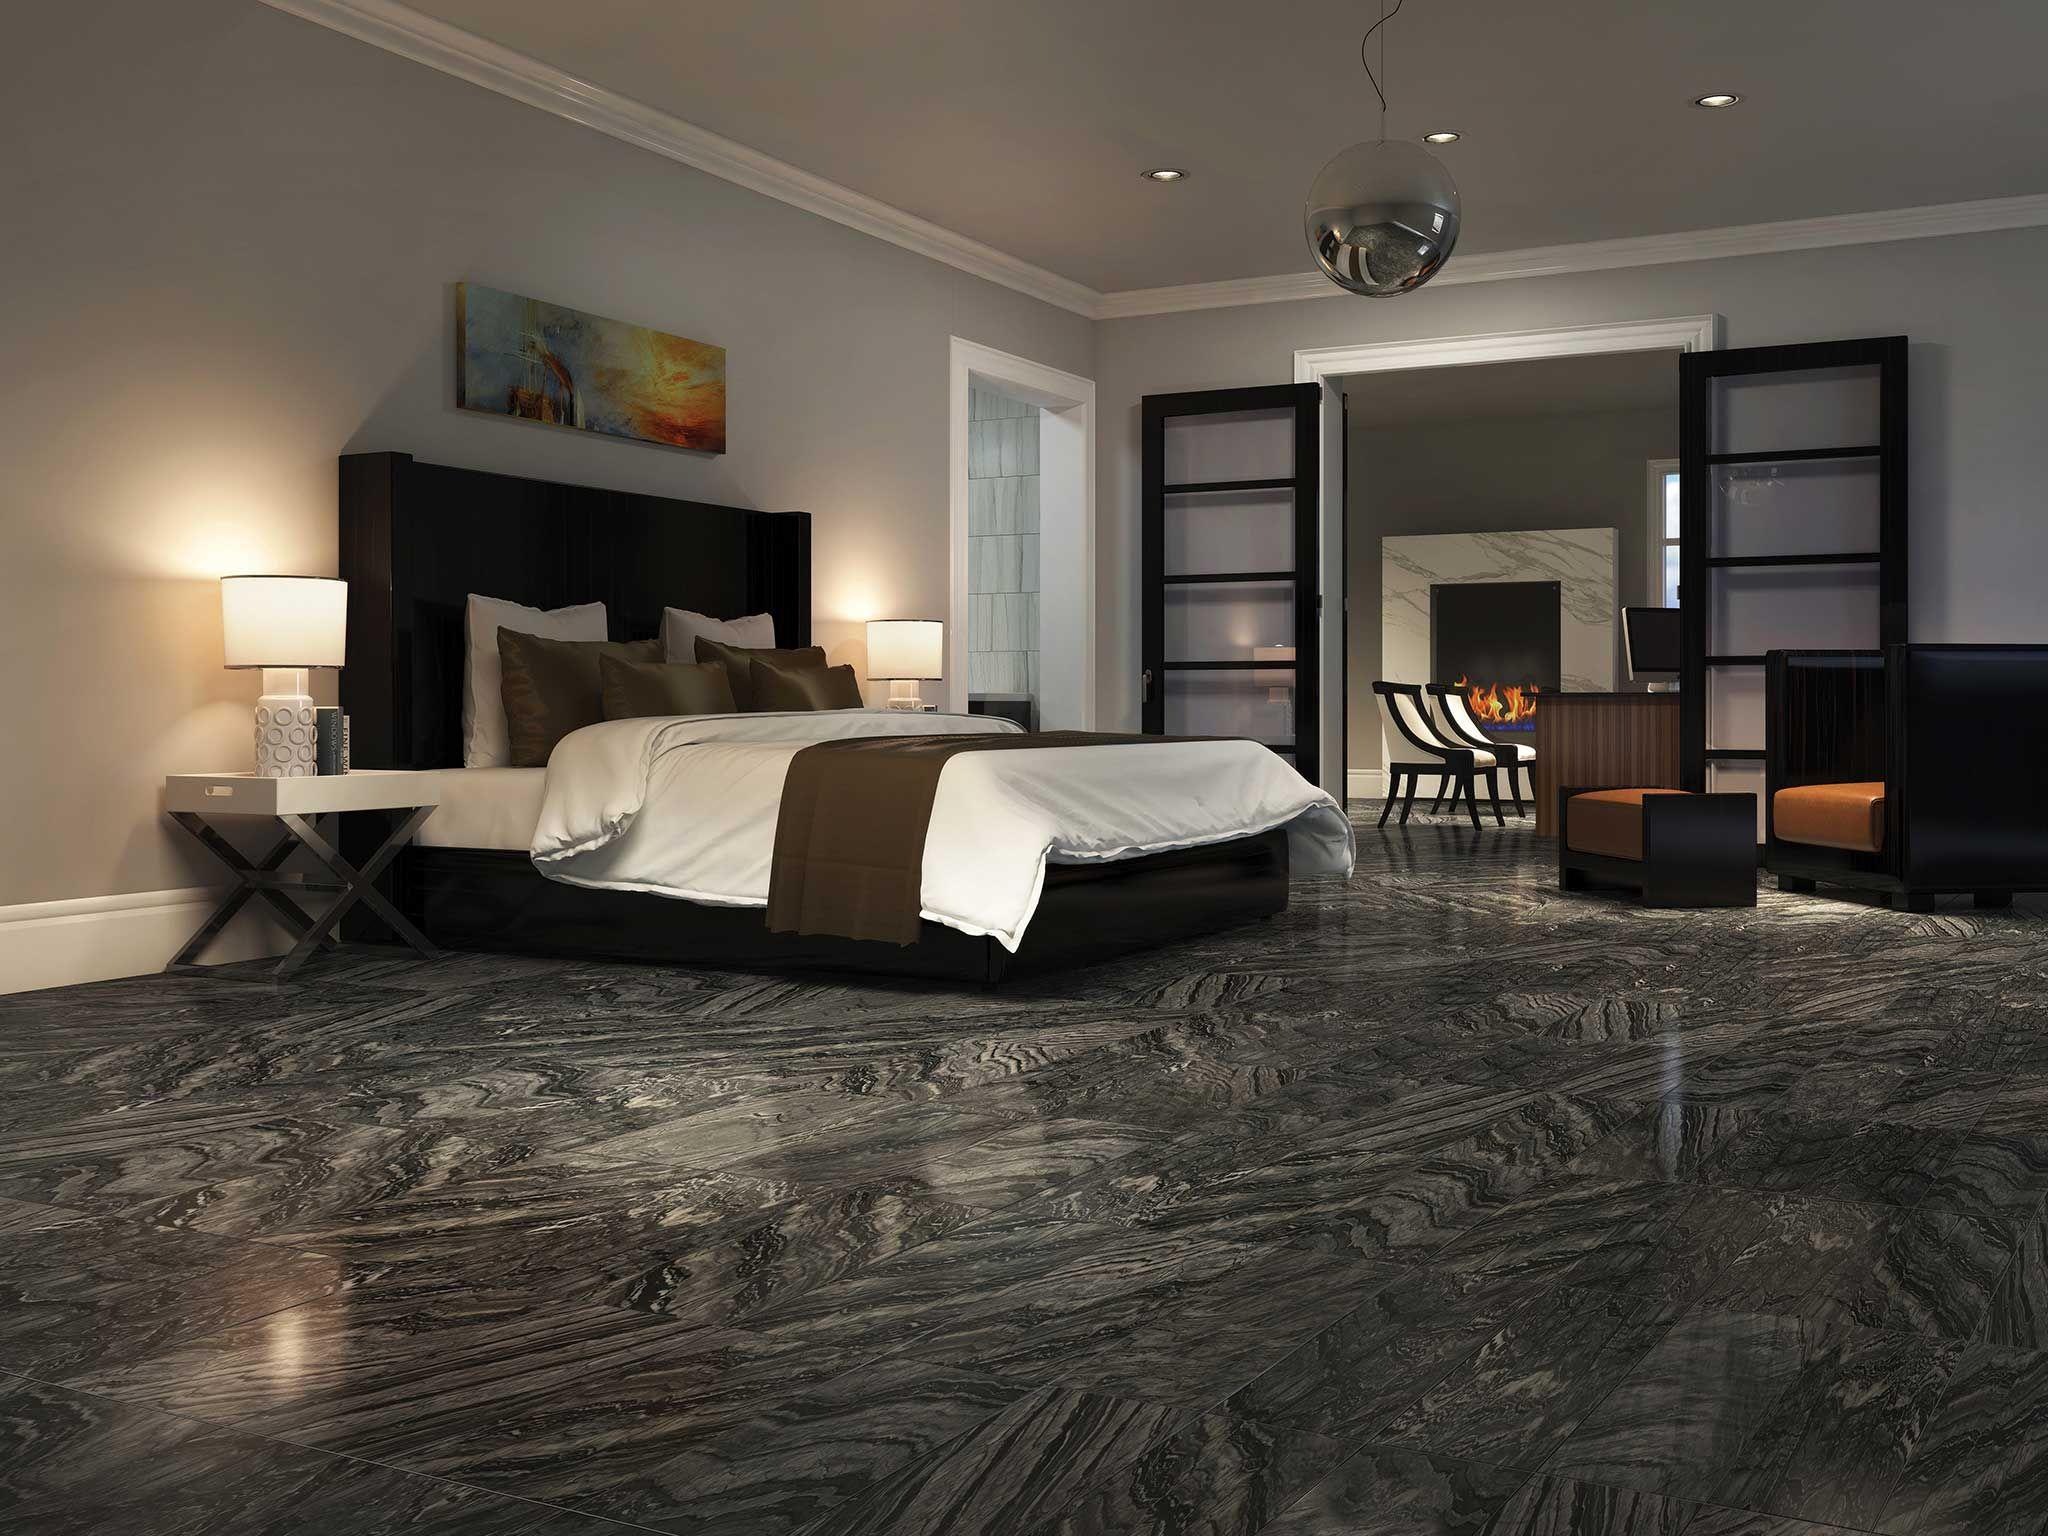 Interceramic Usa Master Suite Remodel Home Bedroom Flooring